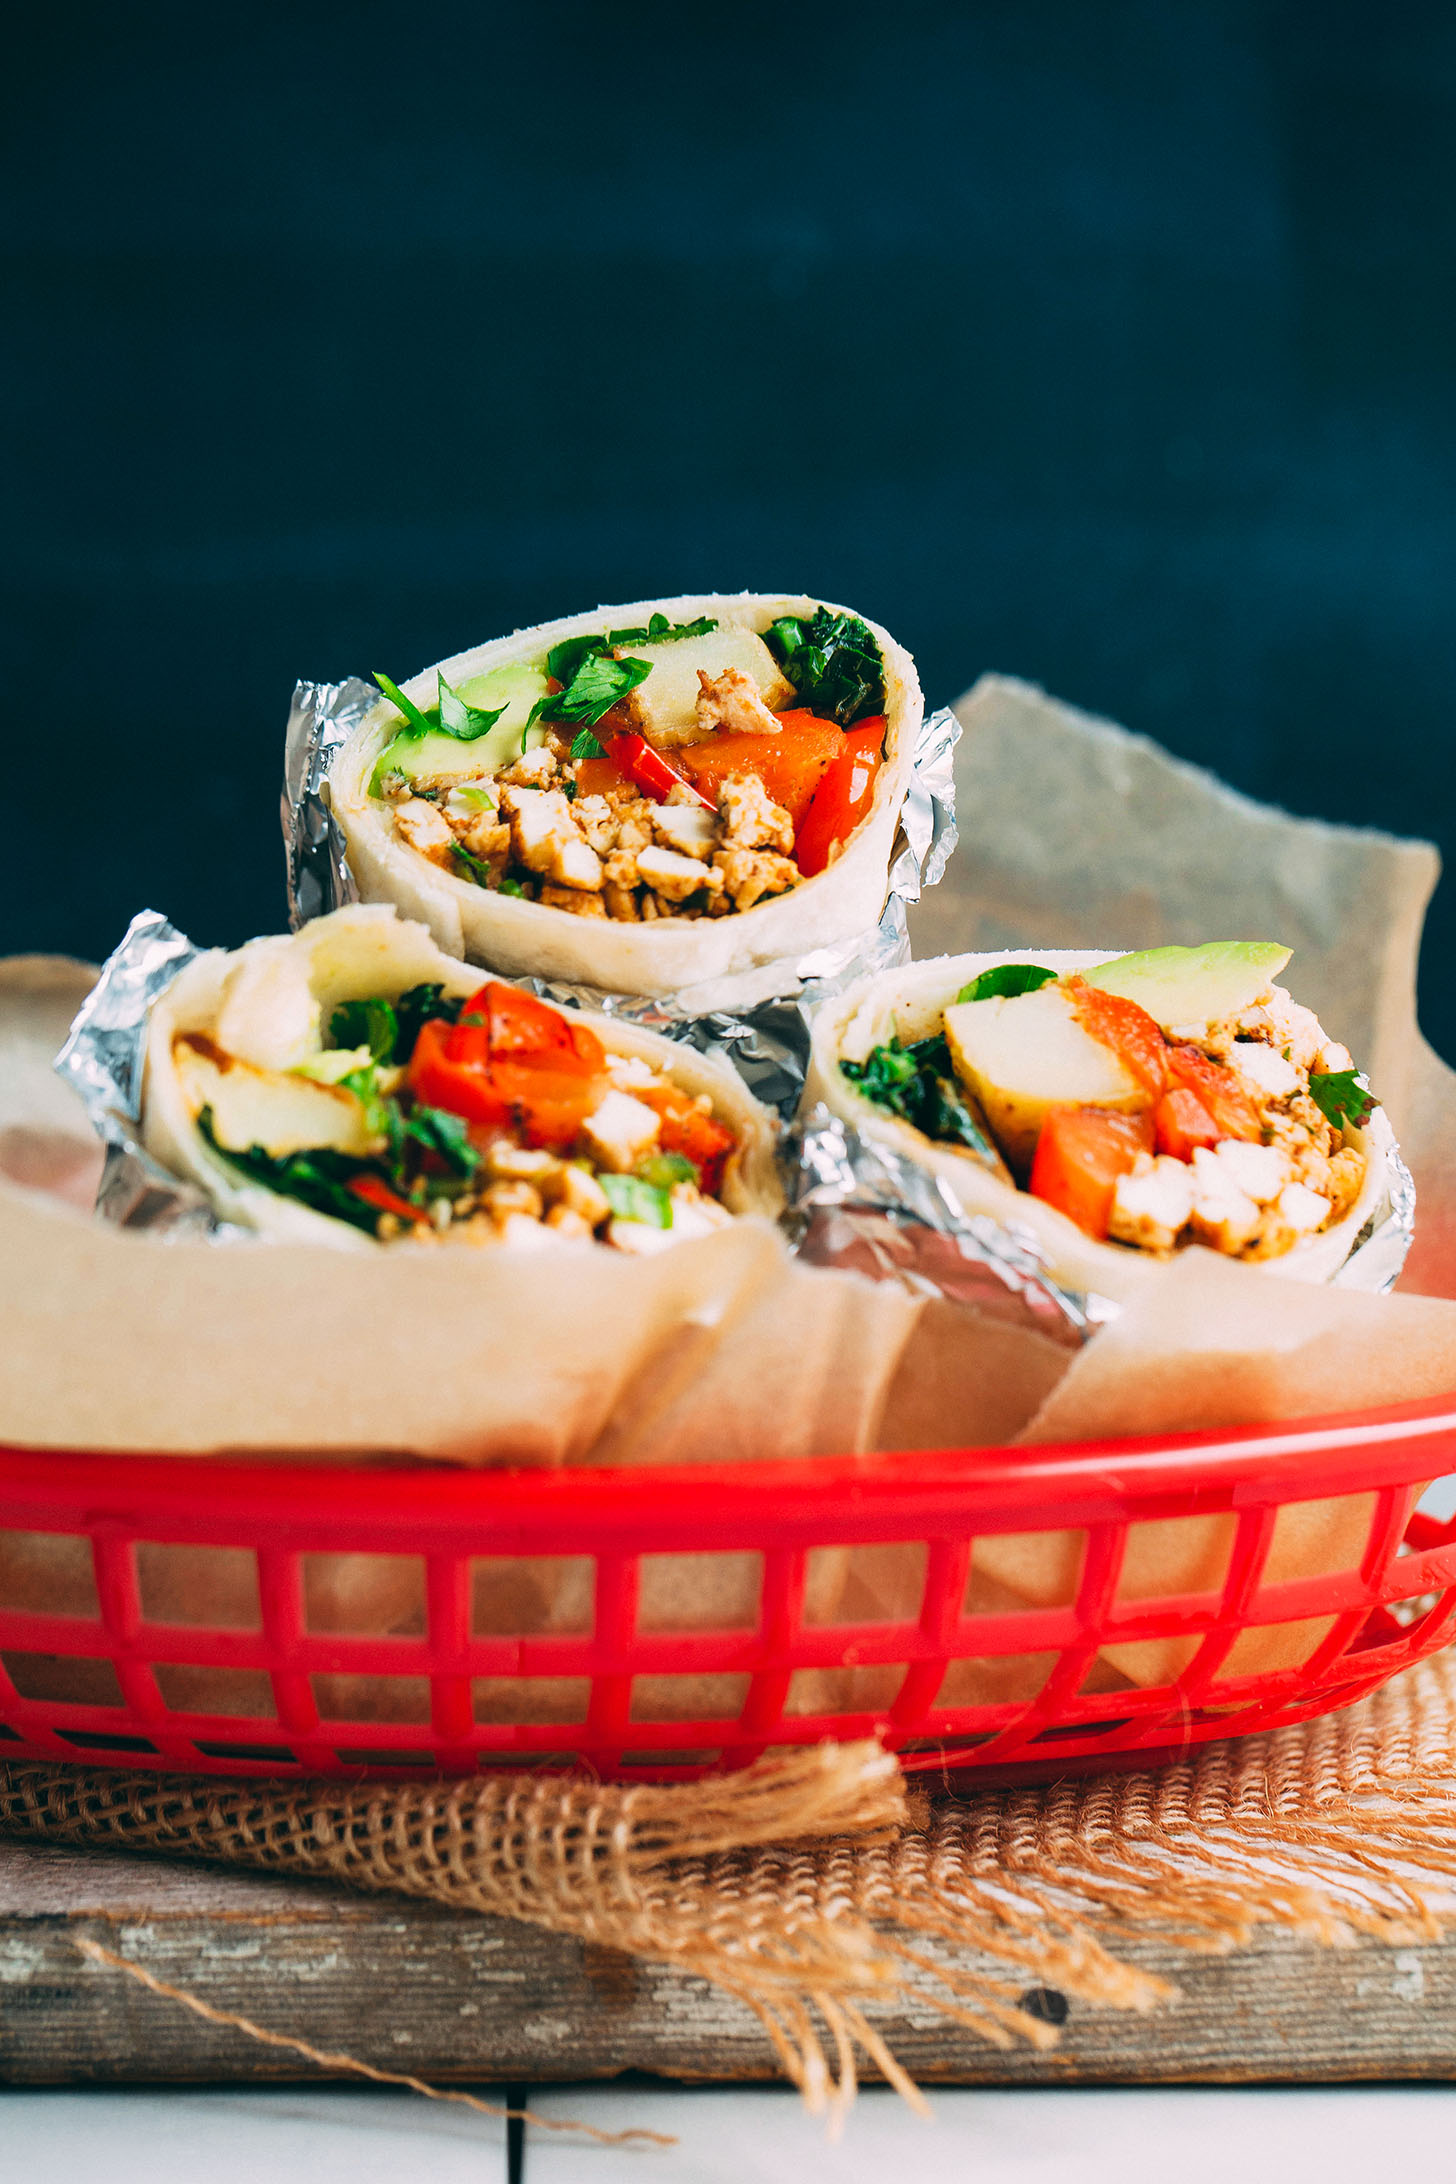 Vegan breakfast burrito in a red tray.